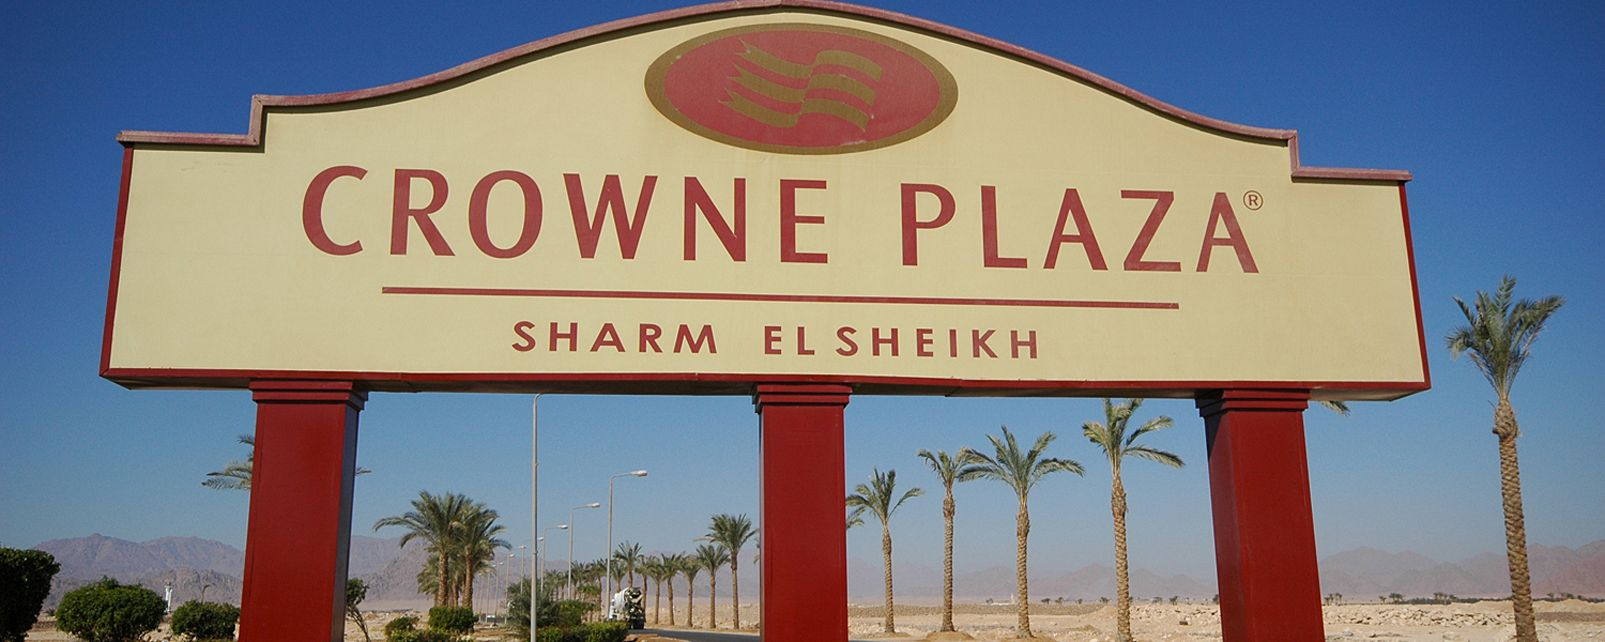 Hôtel Crowne Plaza - Sharm El Sheikh